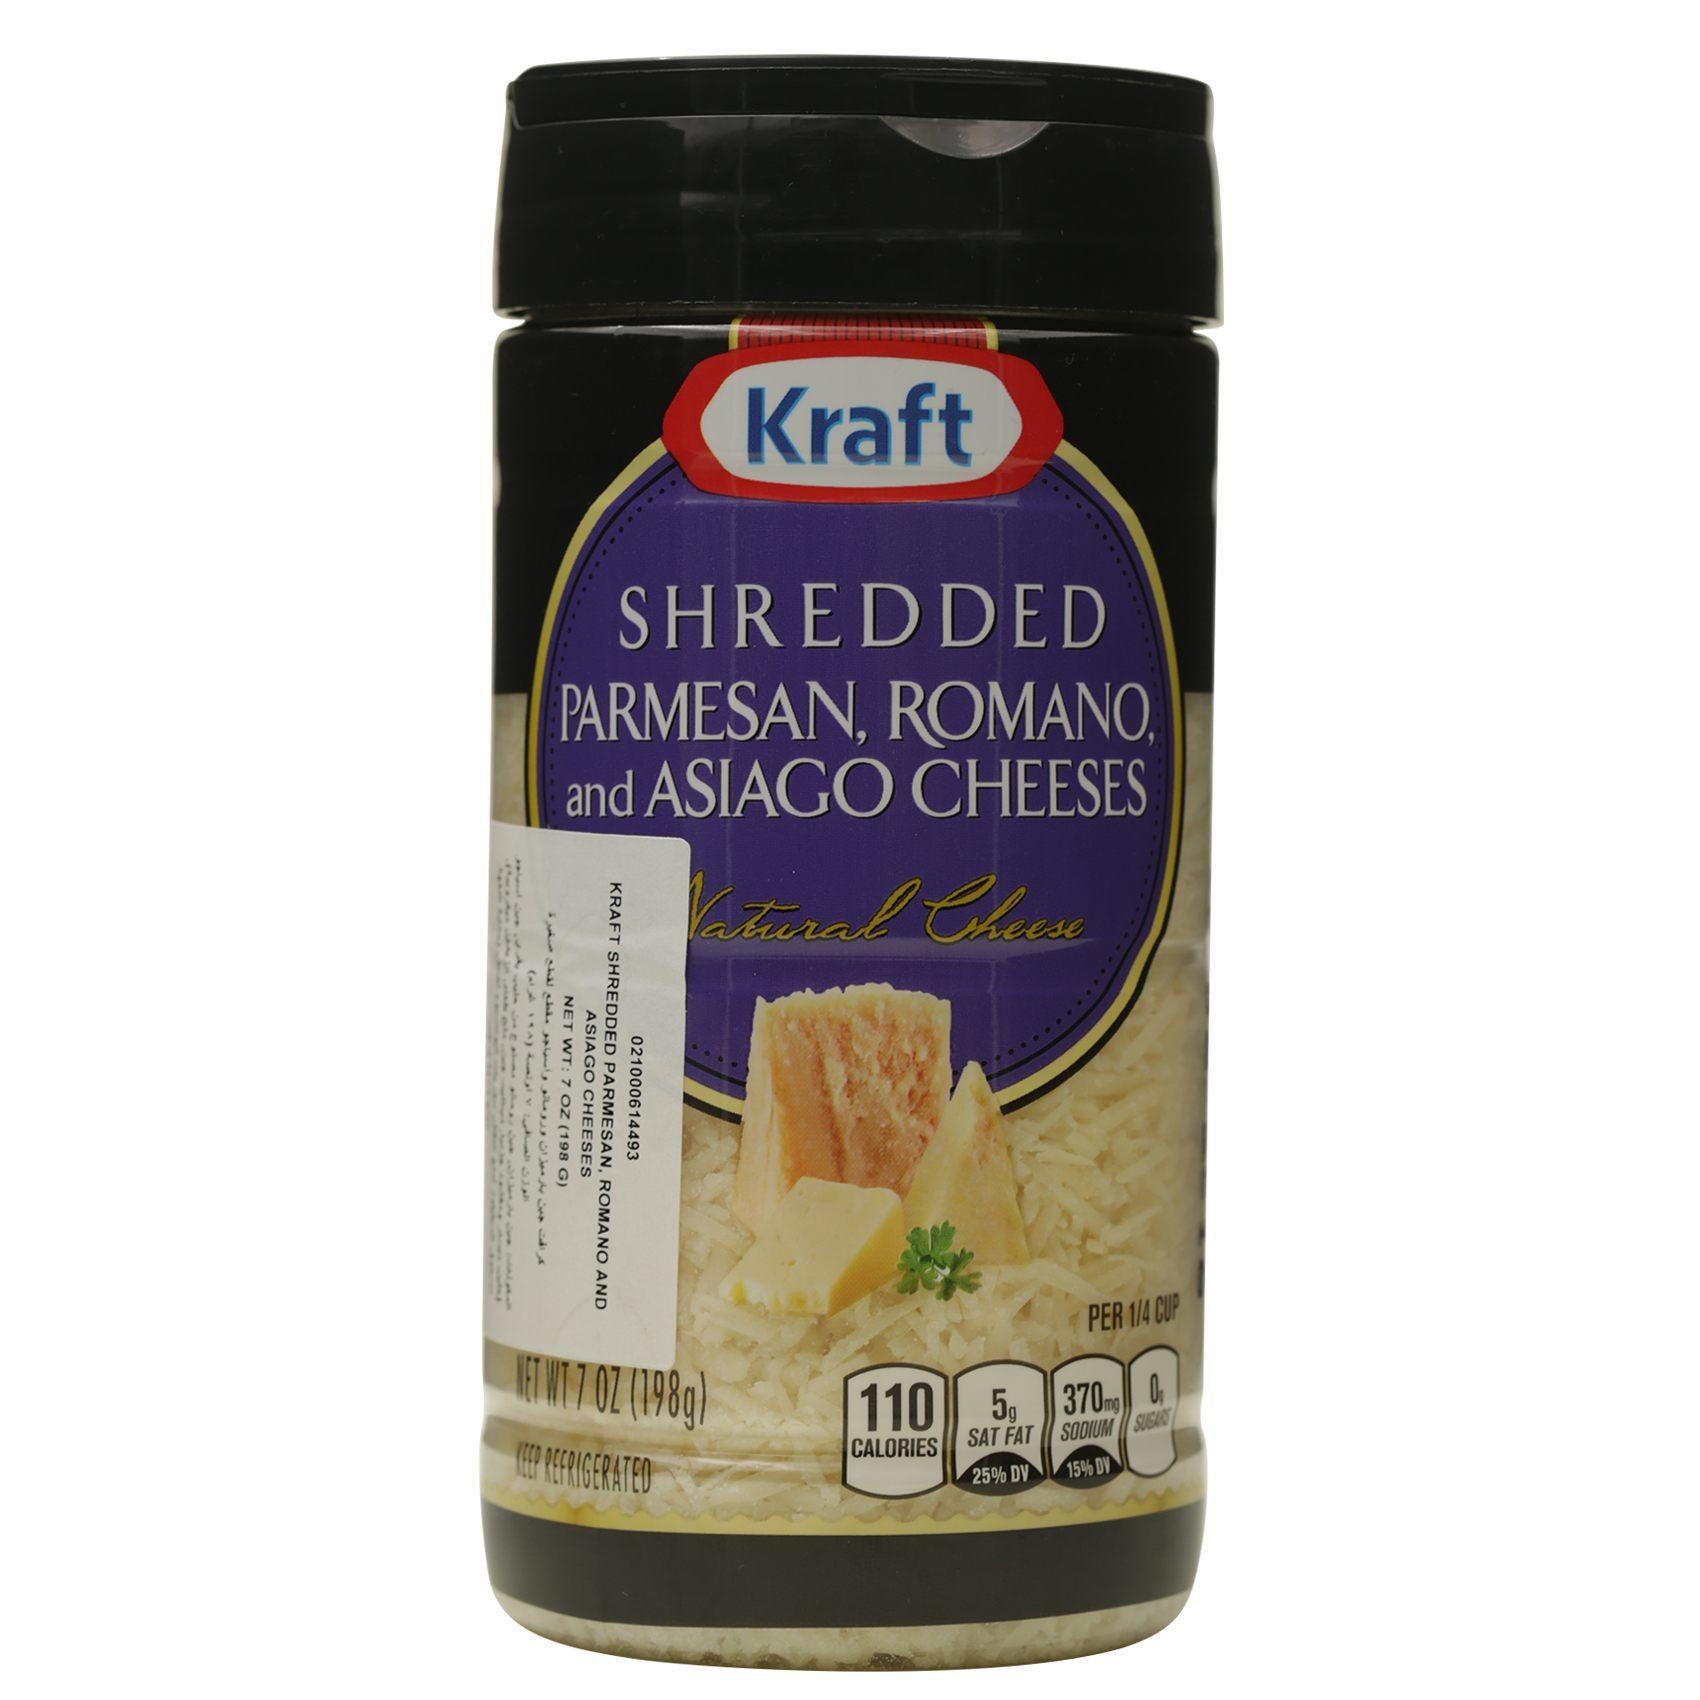 KRAFT SHREDDED PARMESAN 3CHEES 198G